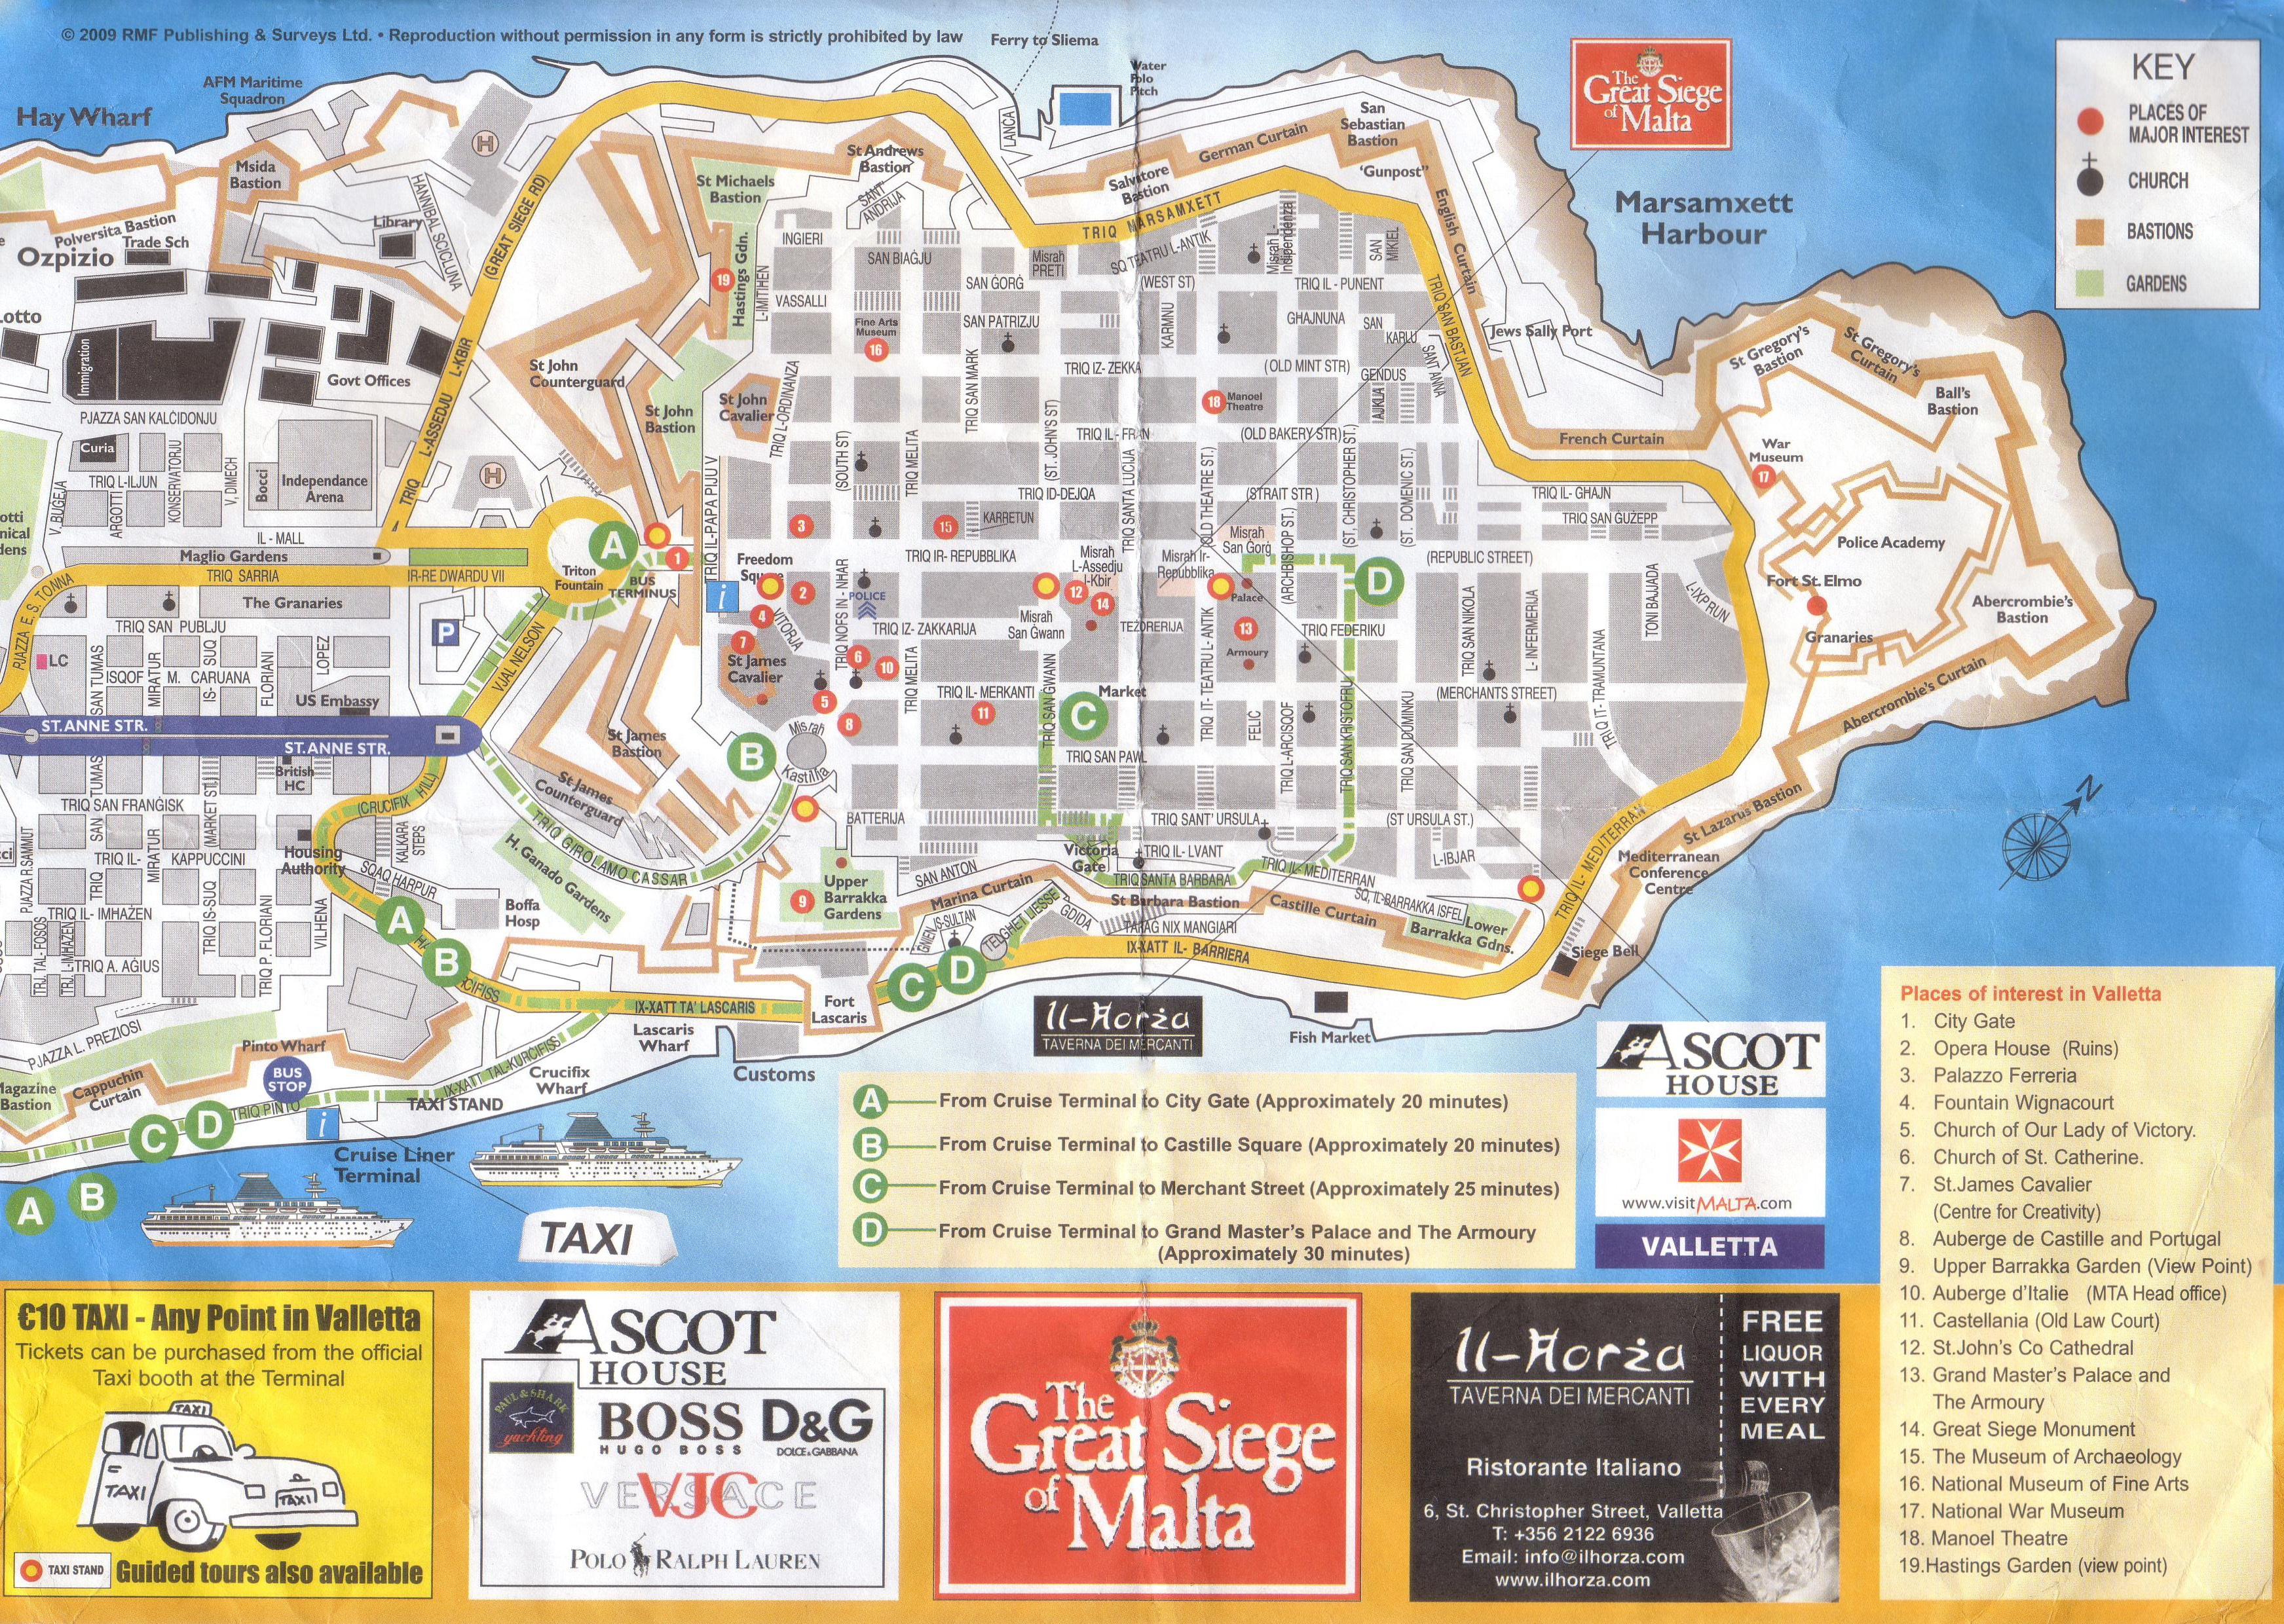 valletta maltese history heritage. Black Bedroom Furniture Sets. Home Design Ideas